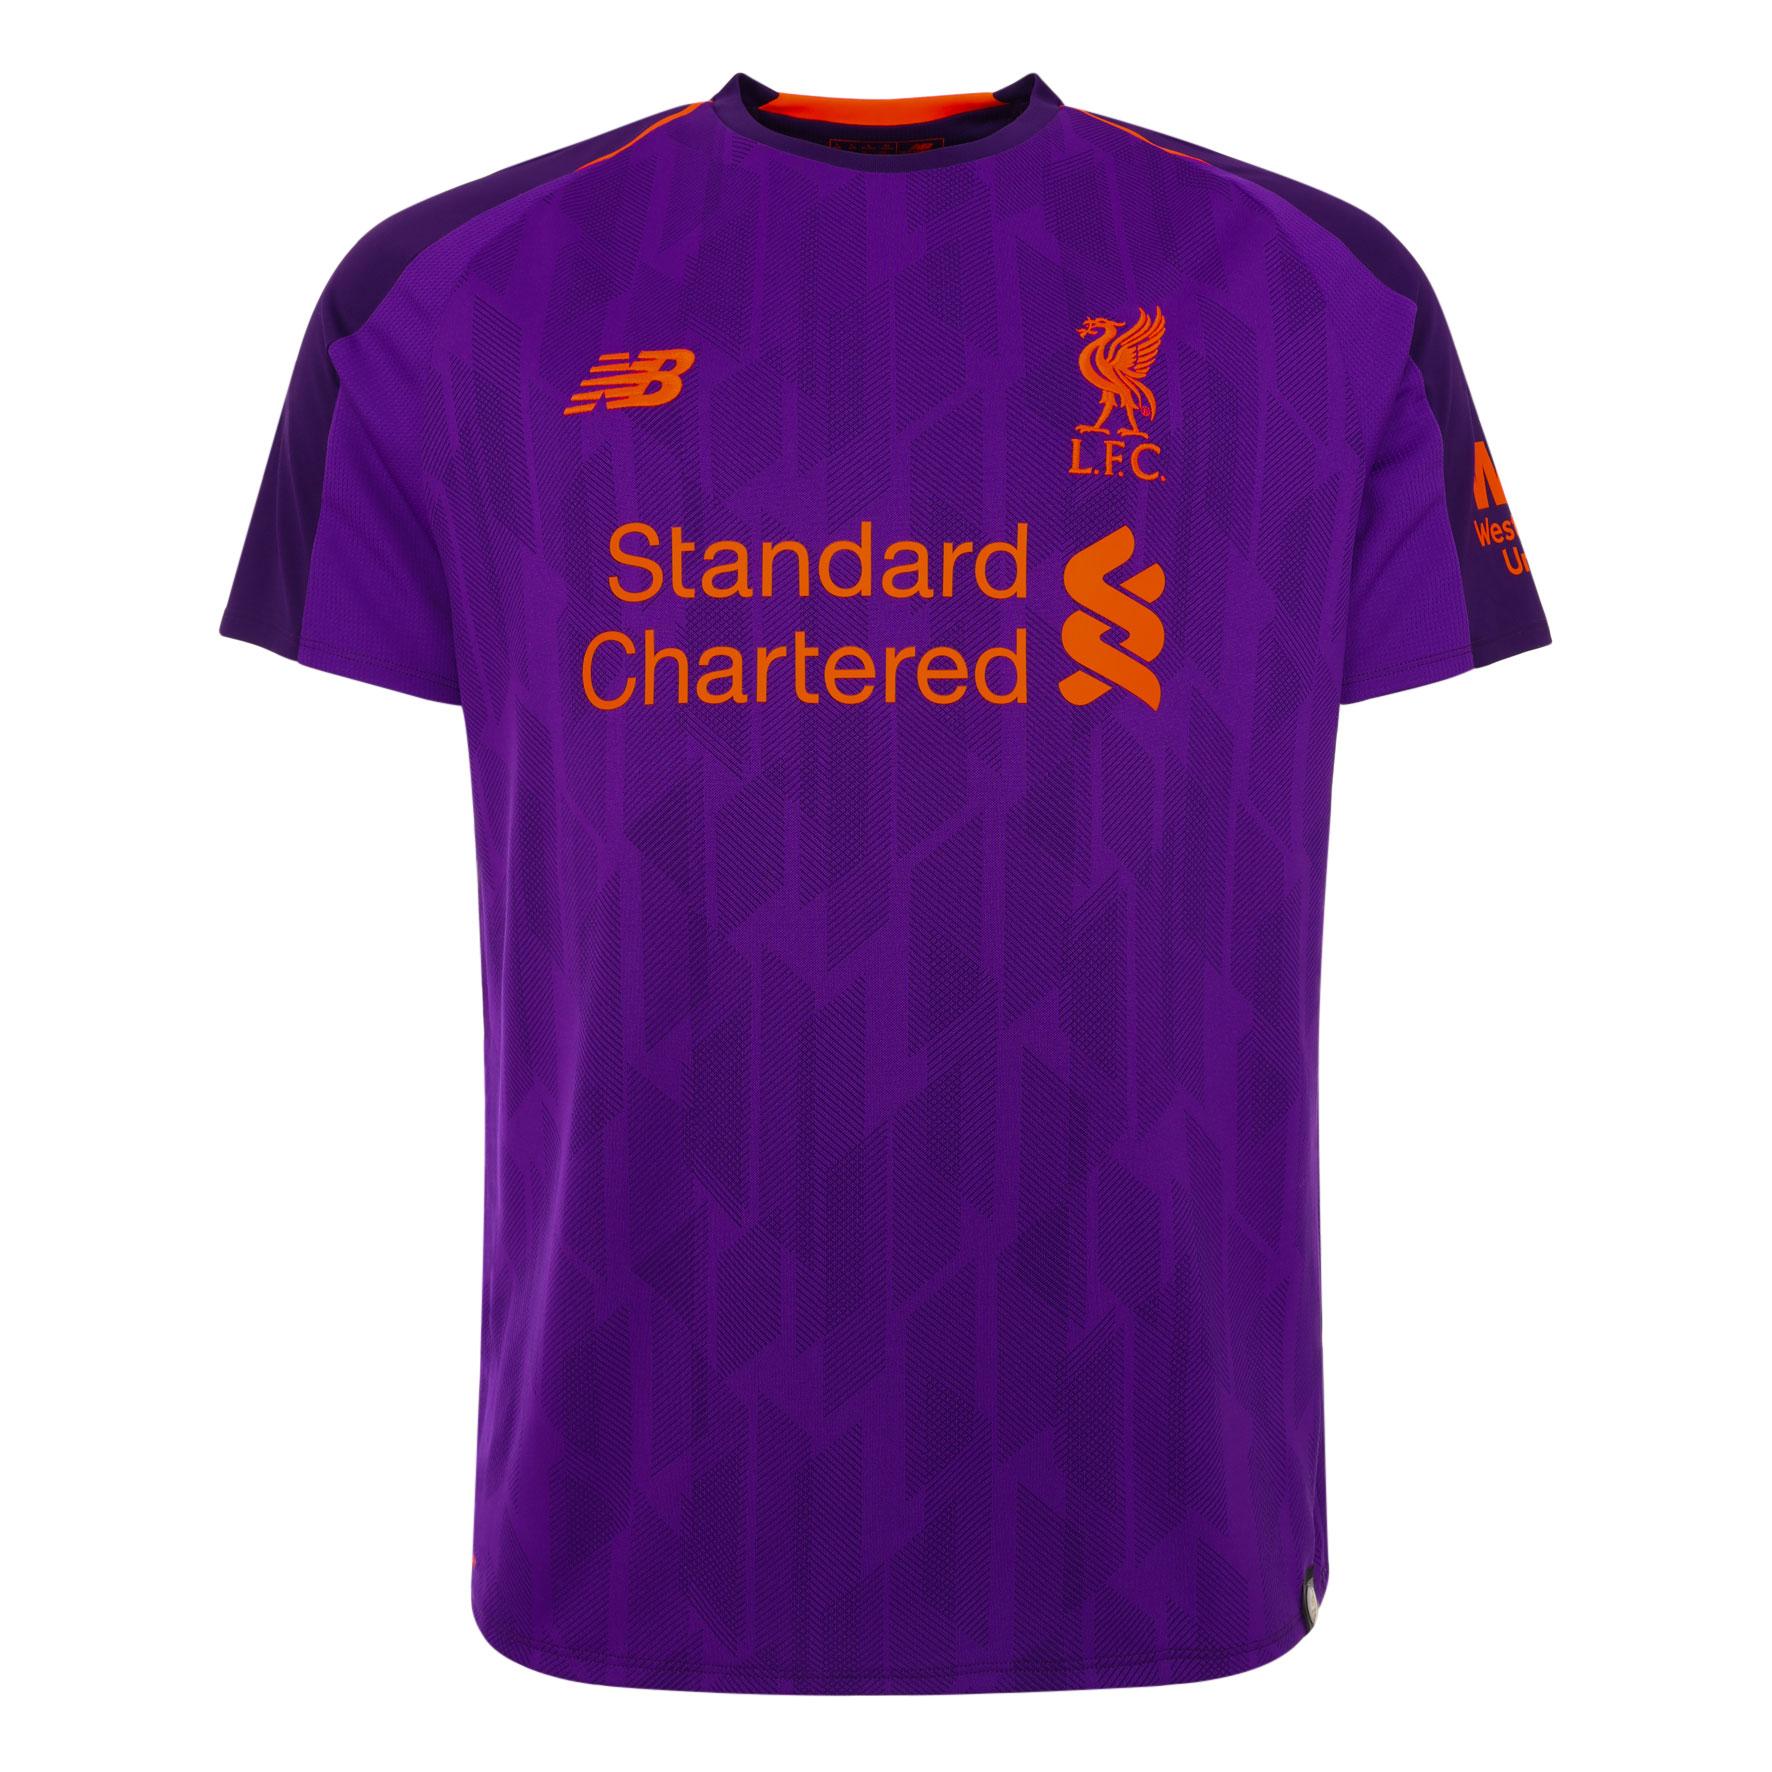 Liverpool 18/19 away kit